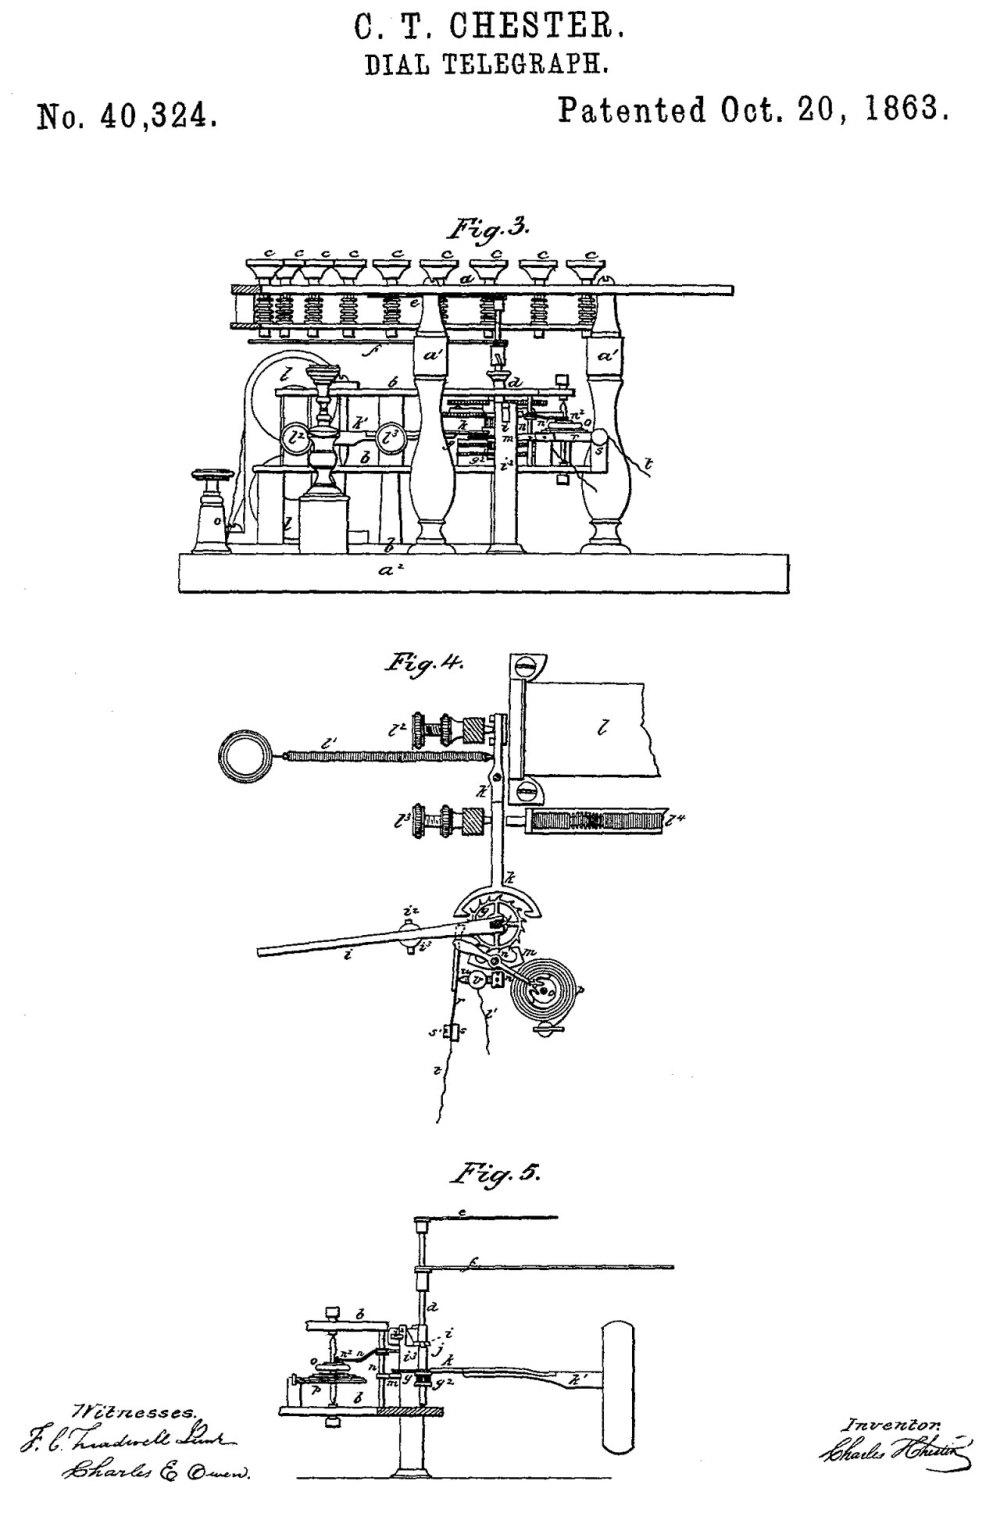 medium resolution of 40324 dial telegraph c t chester